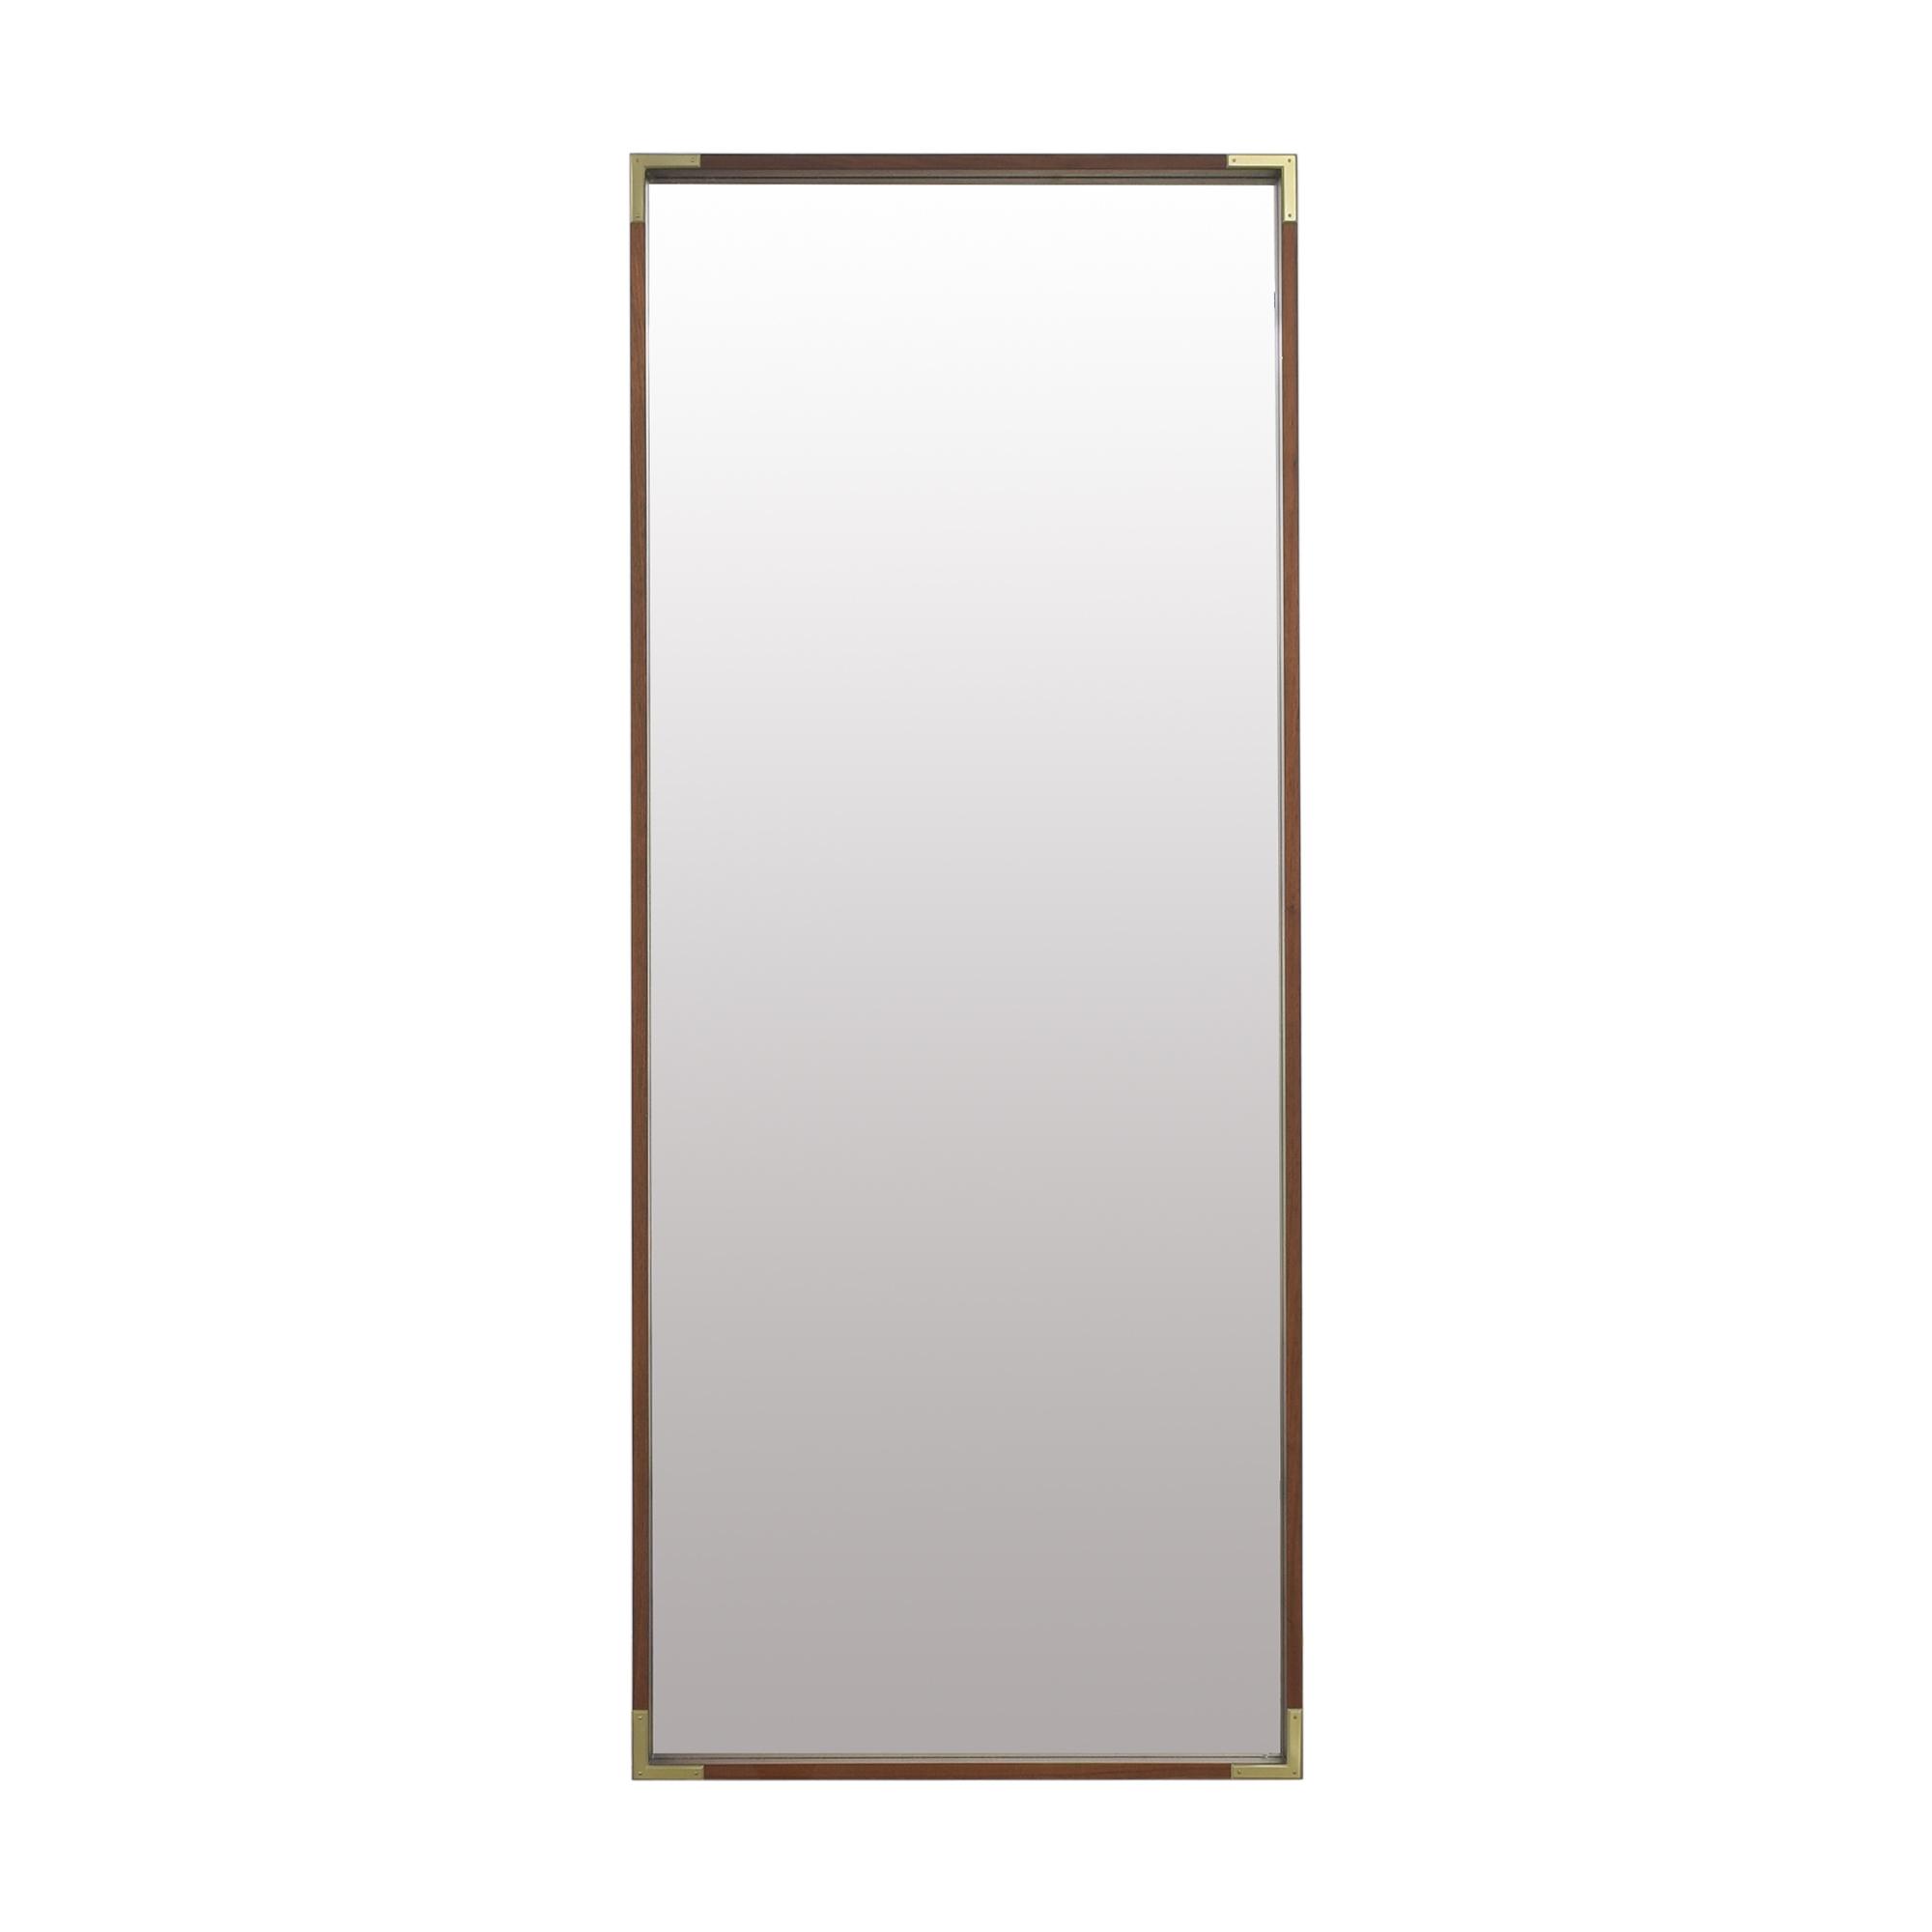 West Elm West Elm Malone Campaign Floor Mirror Mirrors